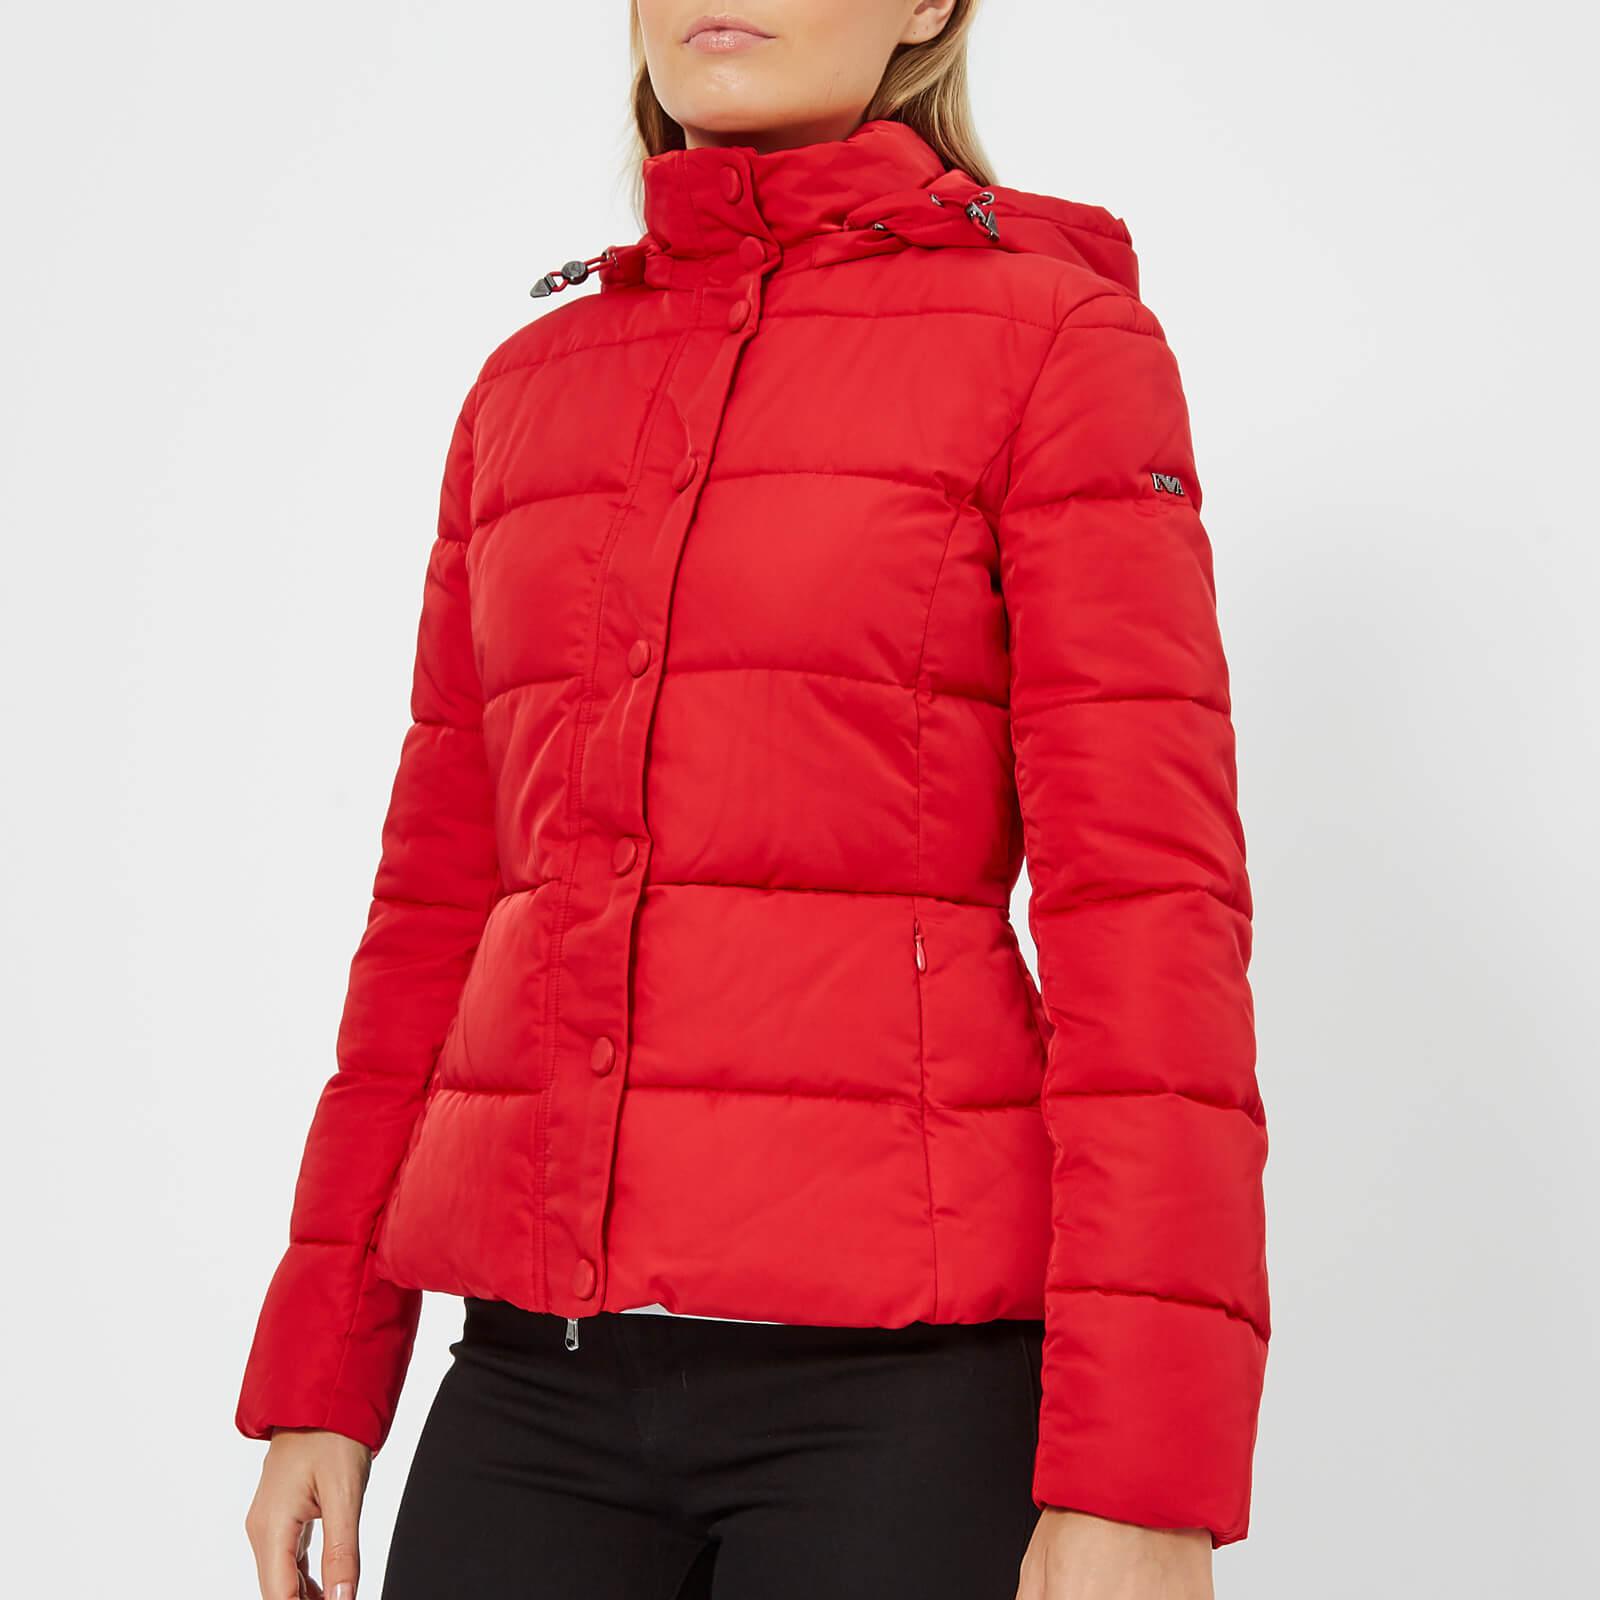 76f68195 Emporio Armani Women's Short Hooded Puffa Jacket - Red